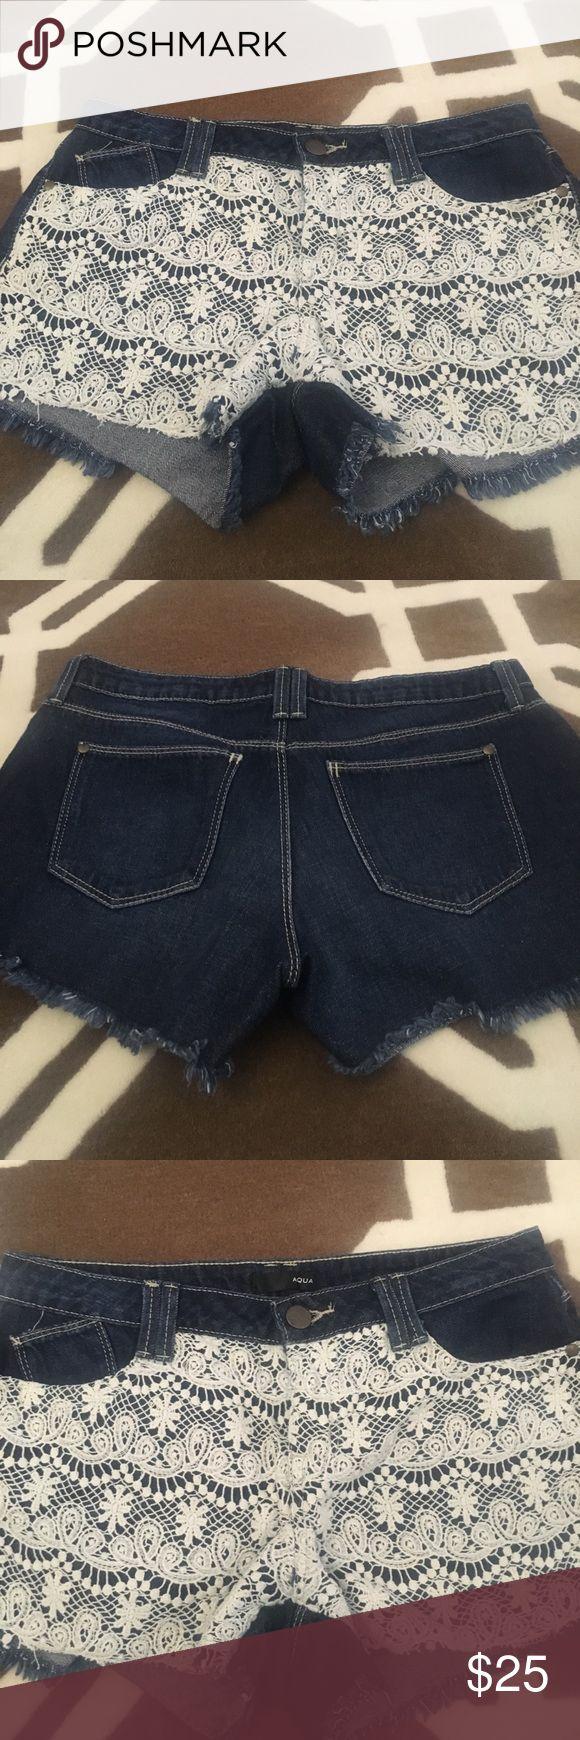 💙Adorable Aqua shorts💙 SO CUTE💙Aqua denim shorts with lace overlay and frayed edges! So cute for summer! Aqua Jeans